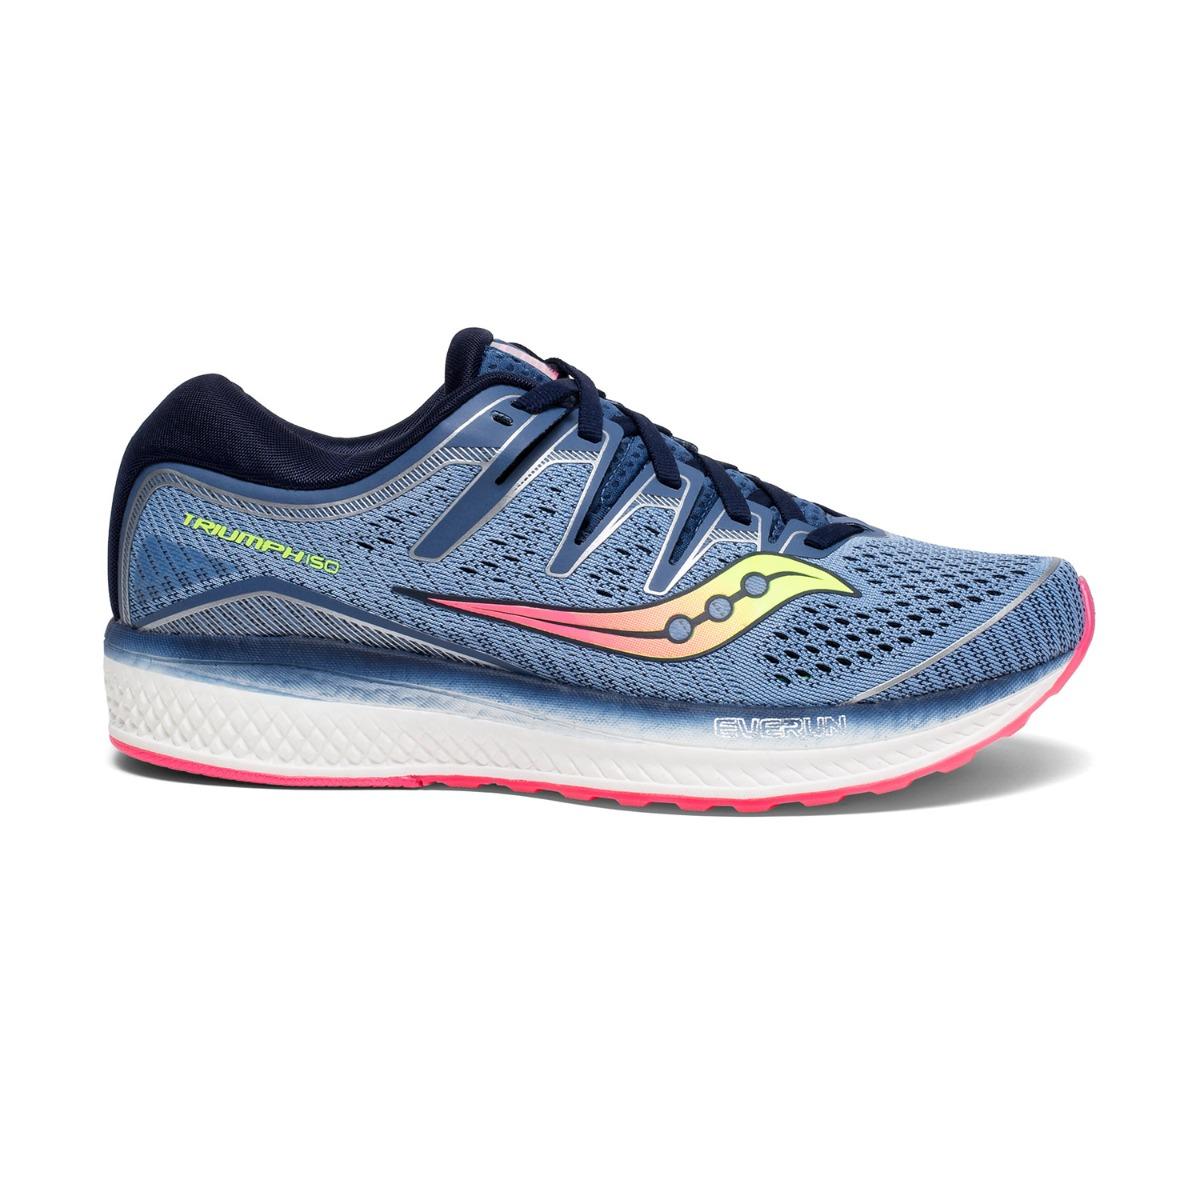 Adidas Supernova ST Women's